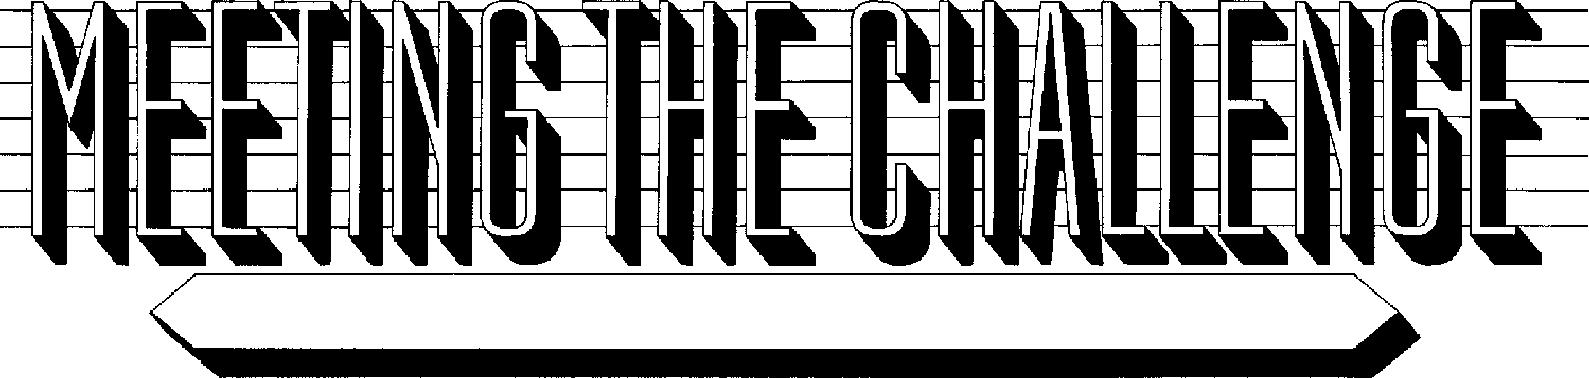 Challenge clipart practica technical